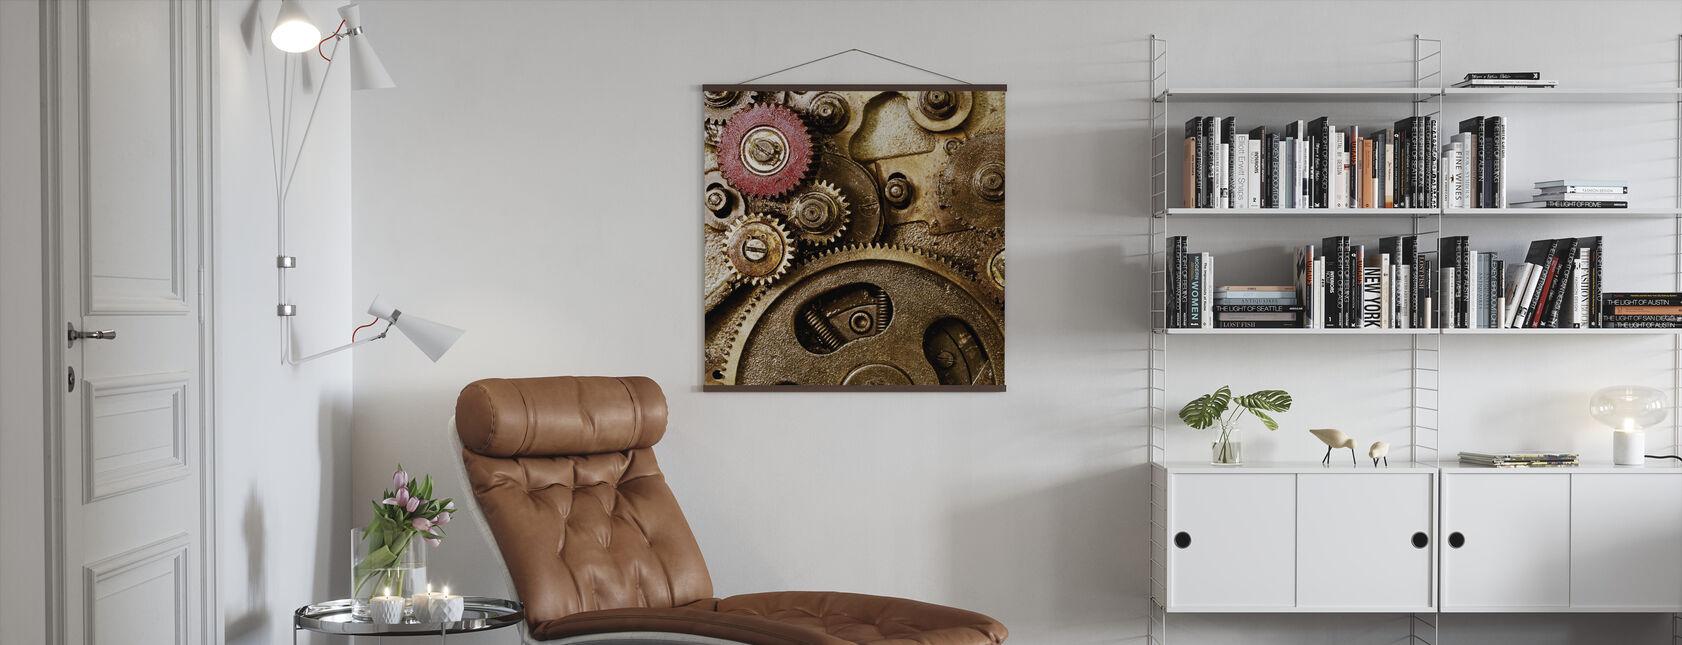 Vintage Gearing - Poster - Living Room